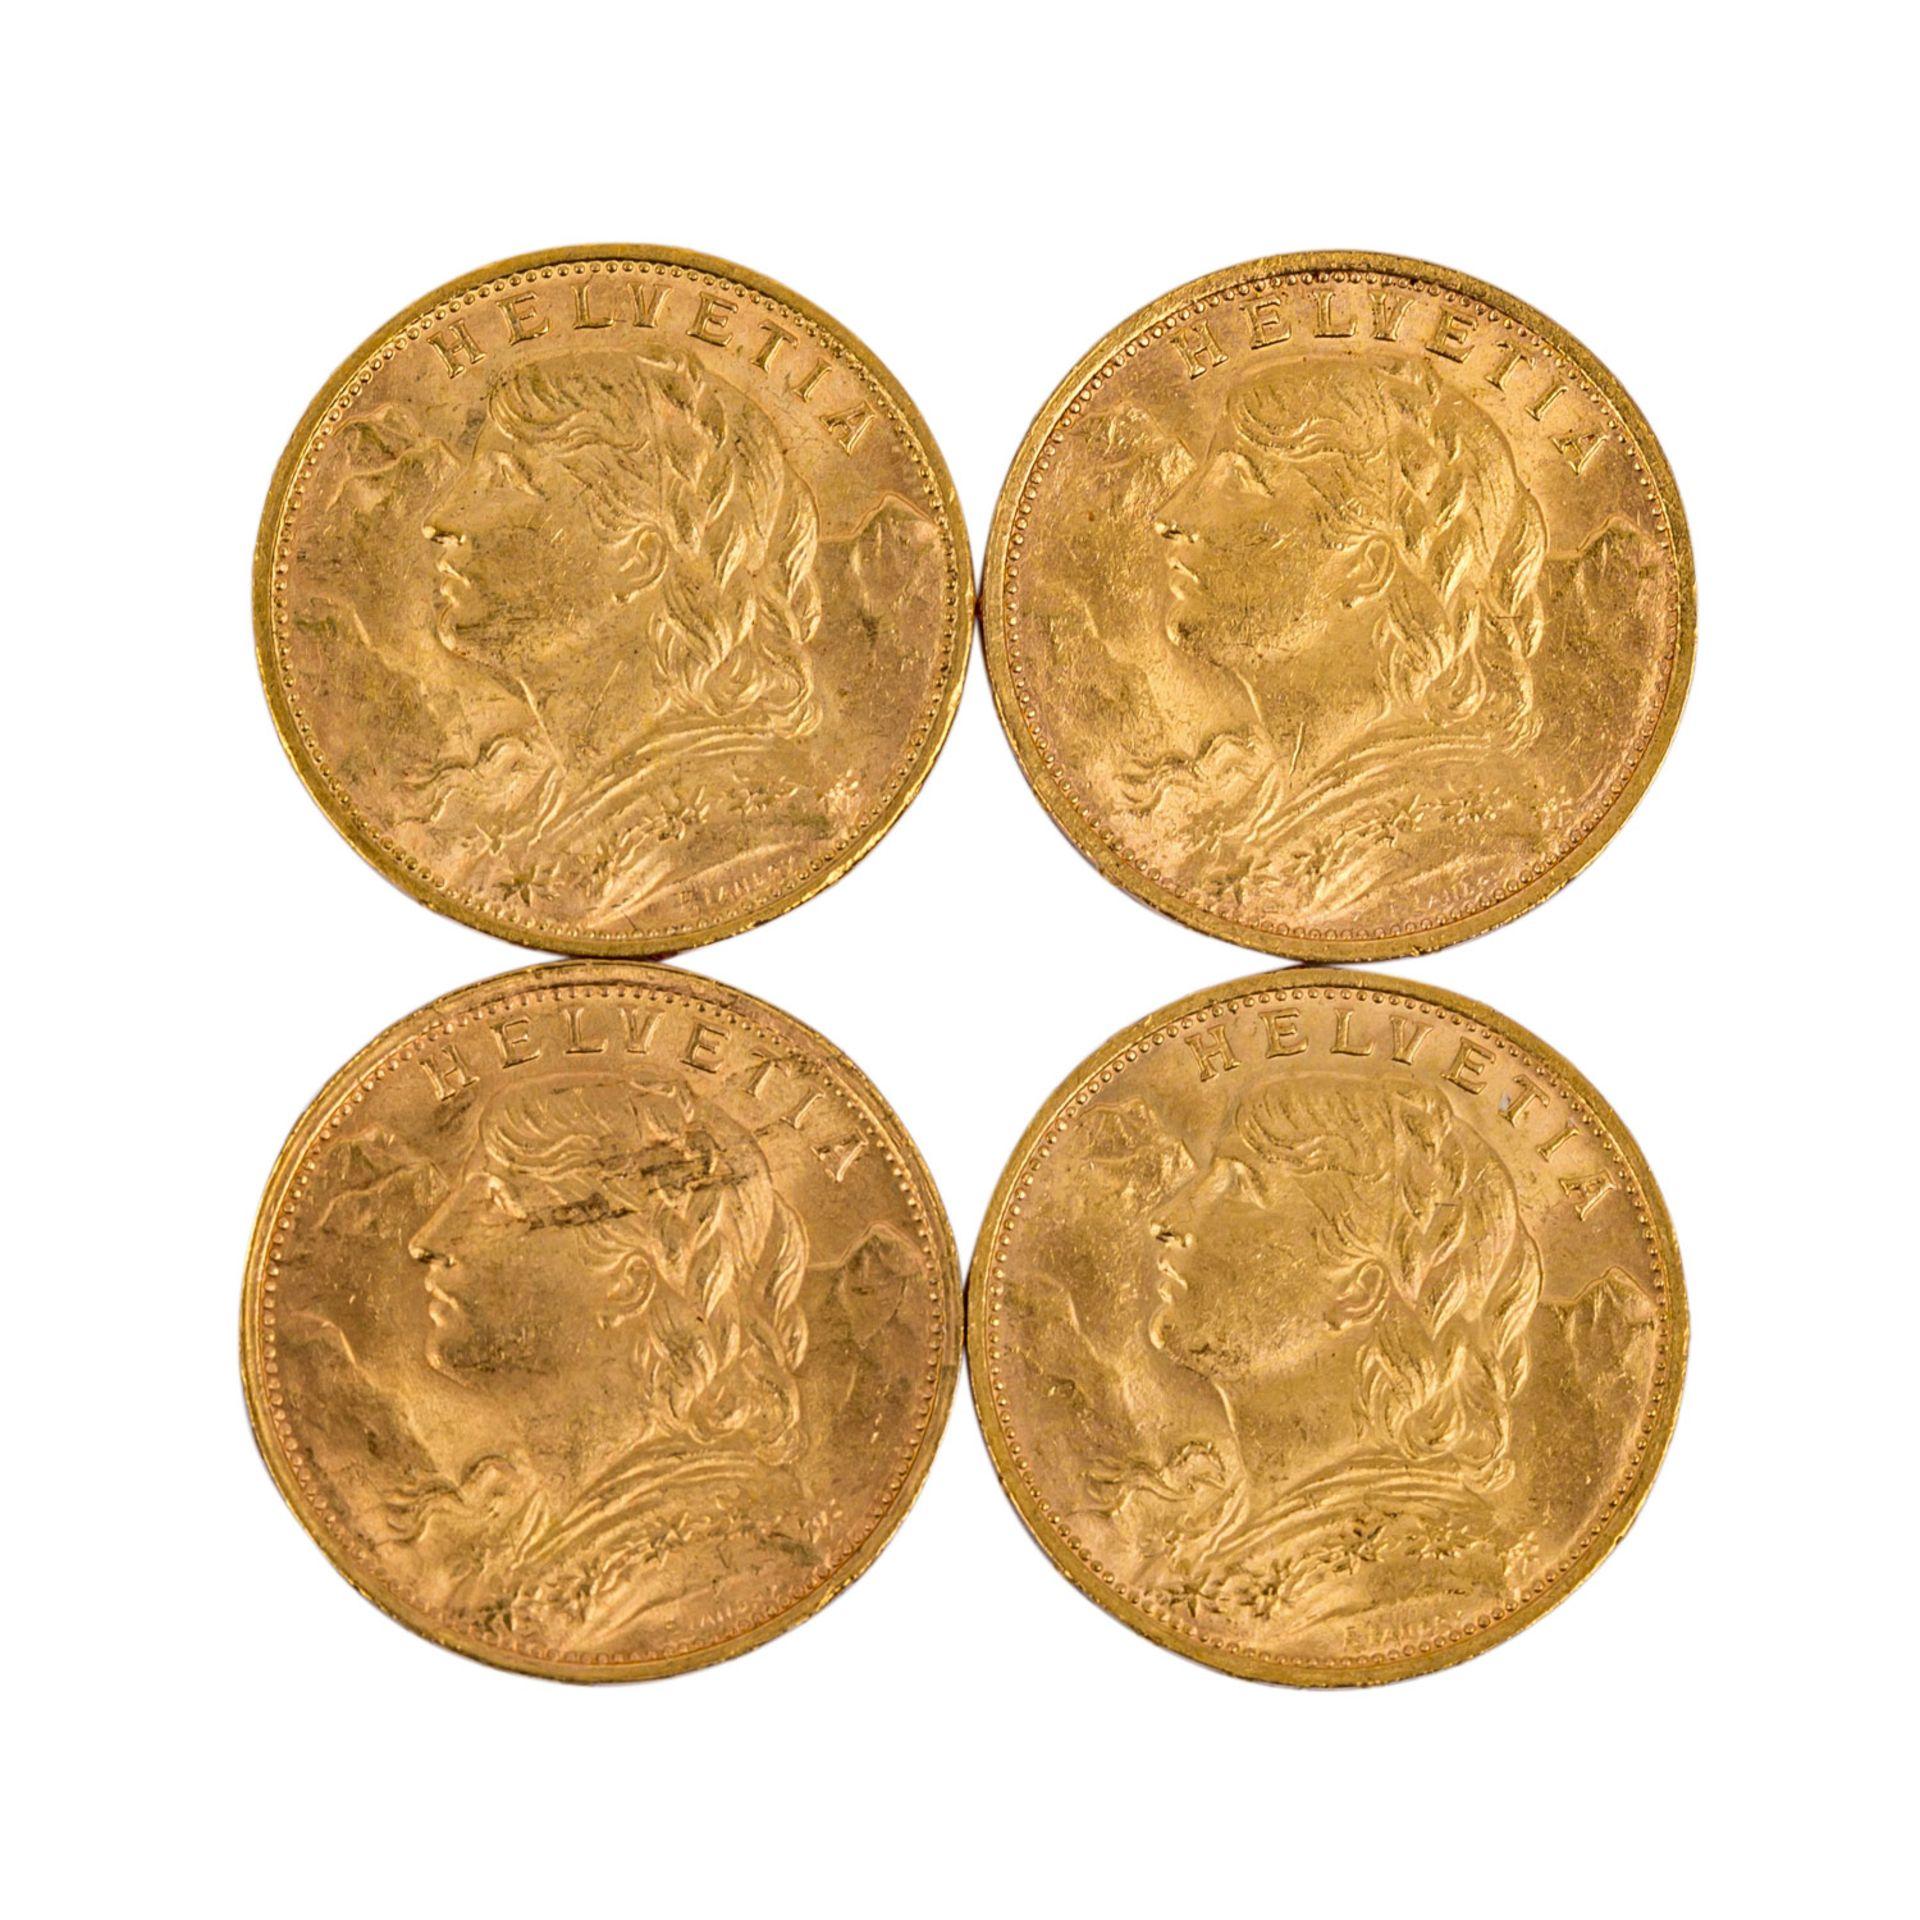 Schweiz - 4 x 20 Franken, Motiv Vreneli,